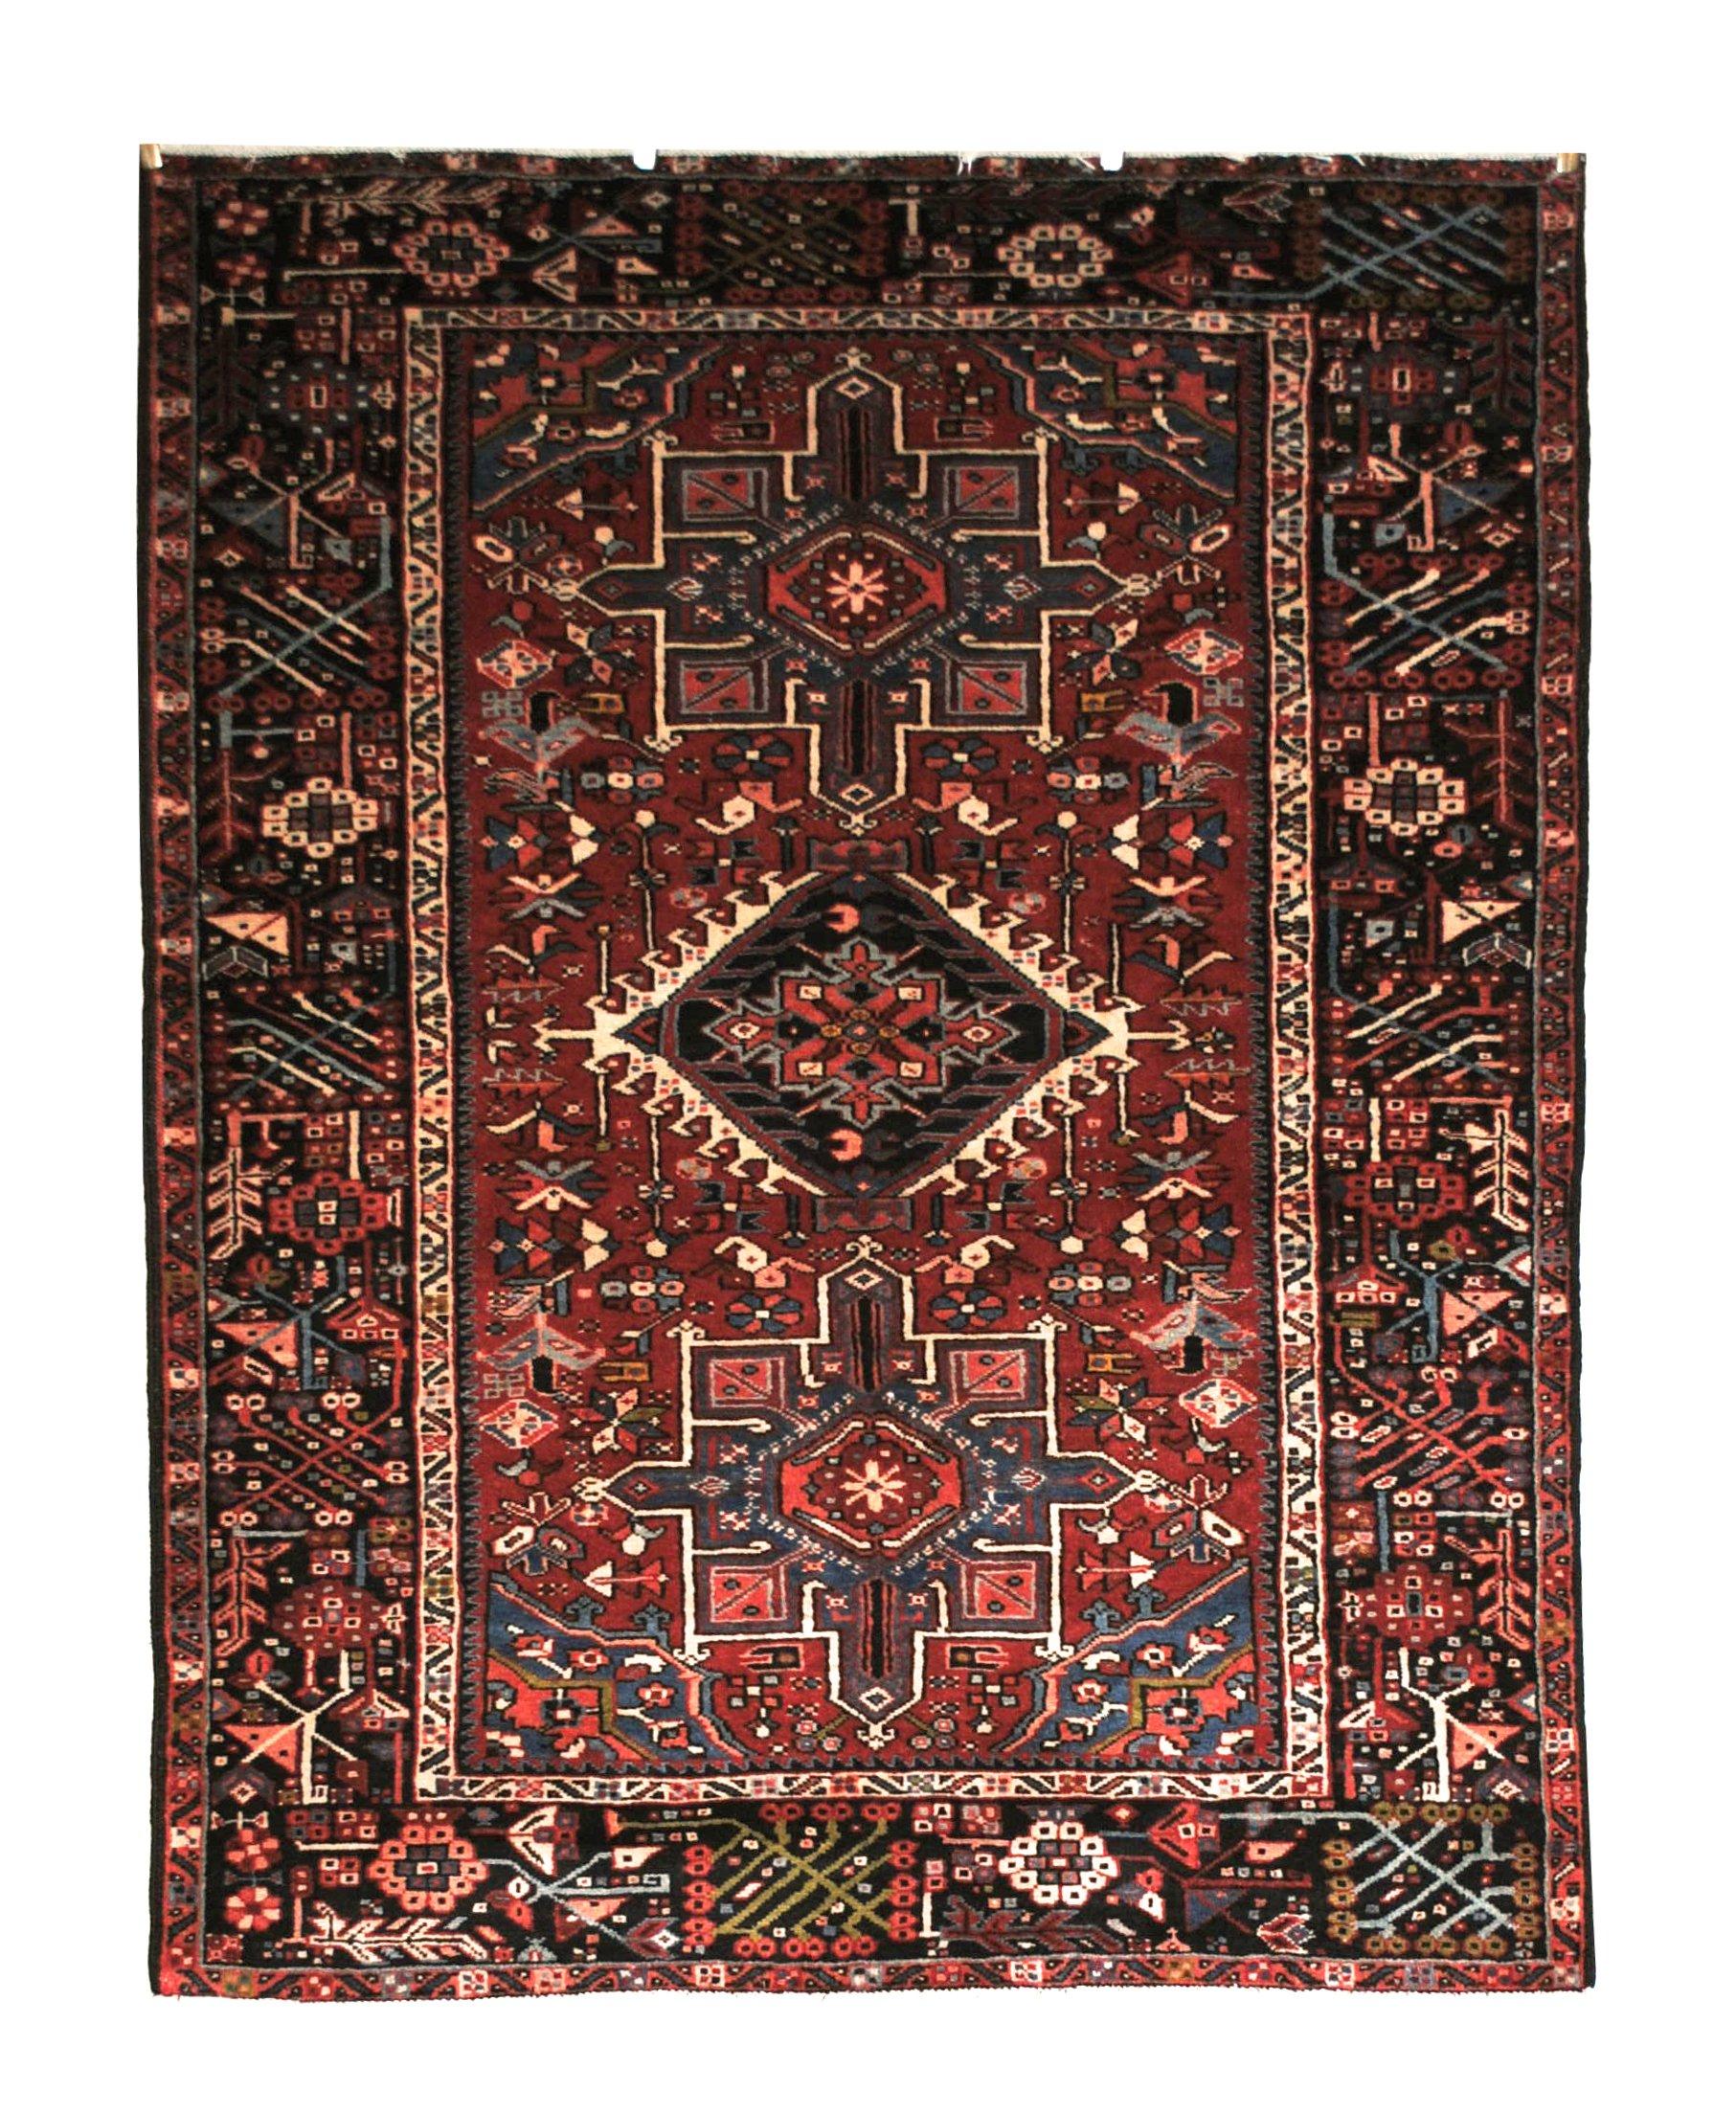 "Antique Persian Karajeh 4' 9"" x 6' 2"" Handmade Wool Area Rug - Shabahang Royal Carpet"